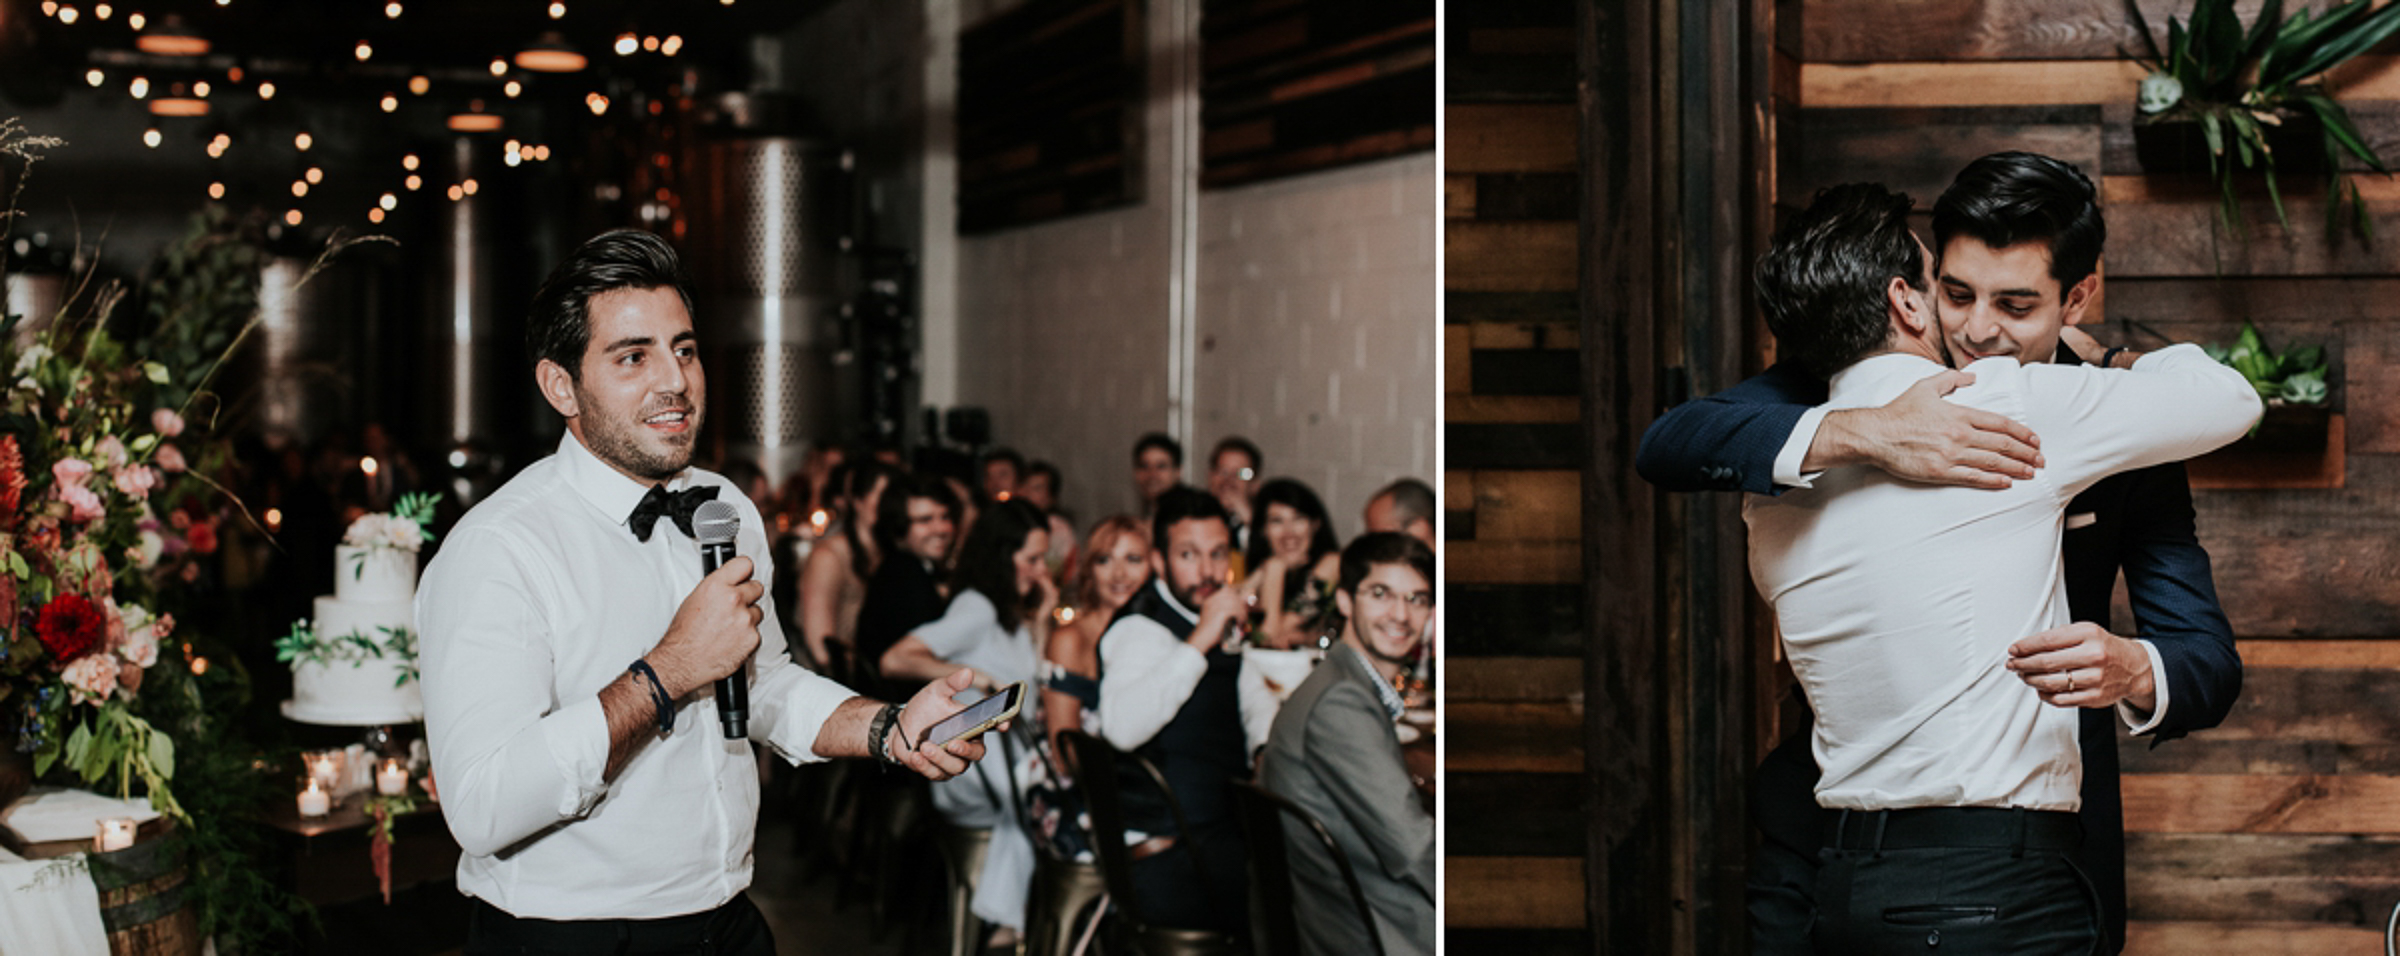 Brooklyn-Winery-NYC-Editorial-Documentary-Wedding-Photographer-Gina-Oli-135.jpg